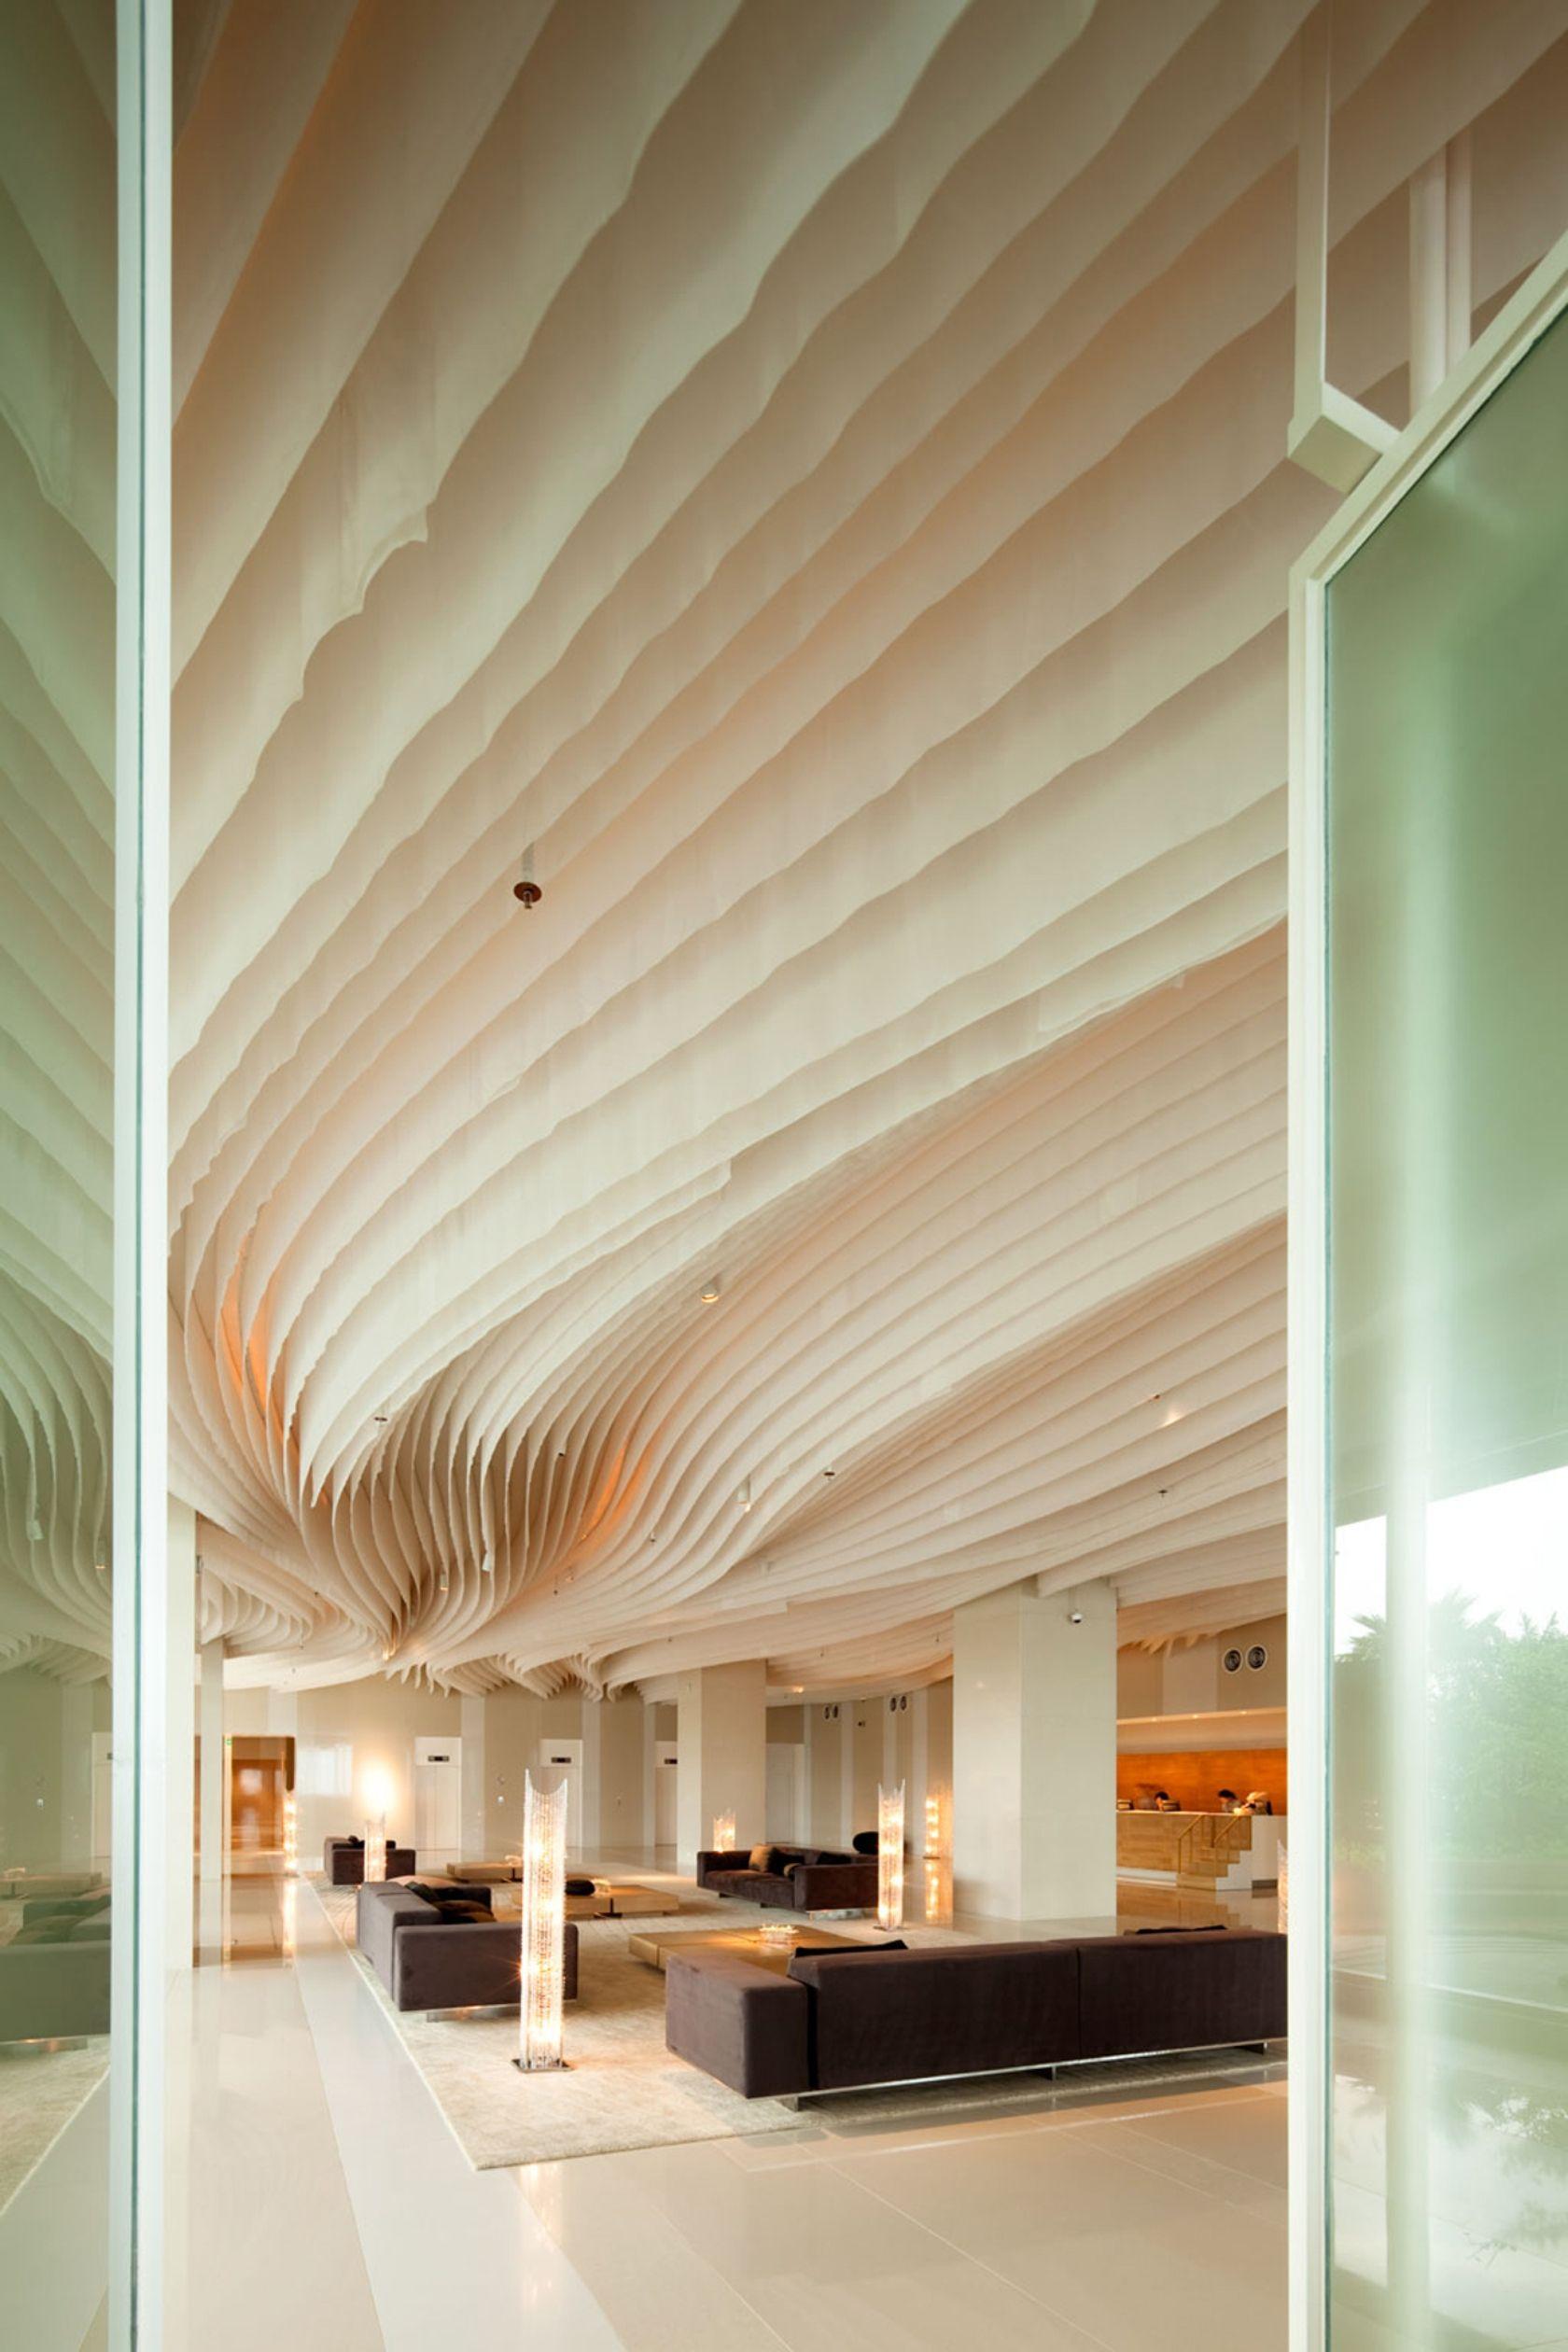 Hilton pattaya lobby bar and linkage spaces